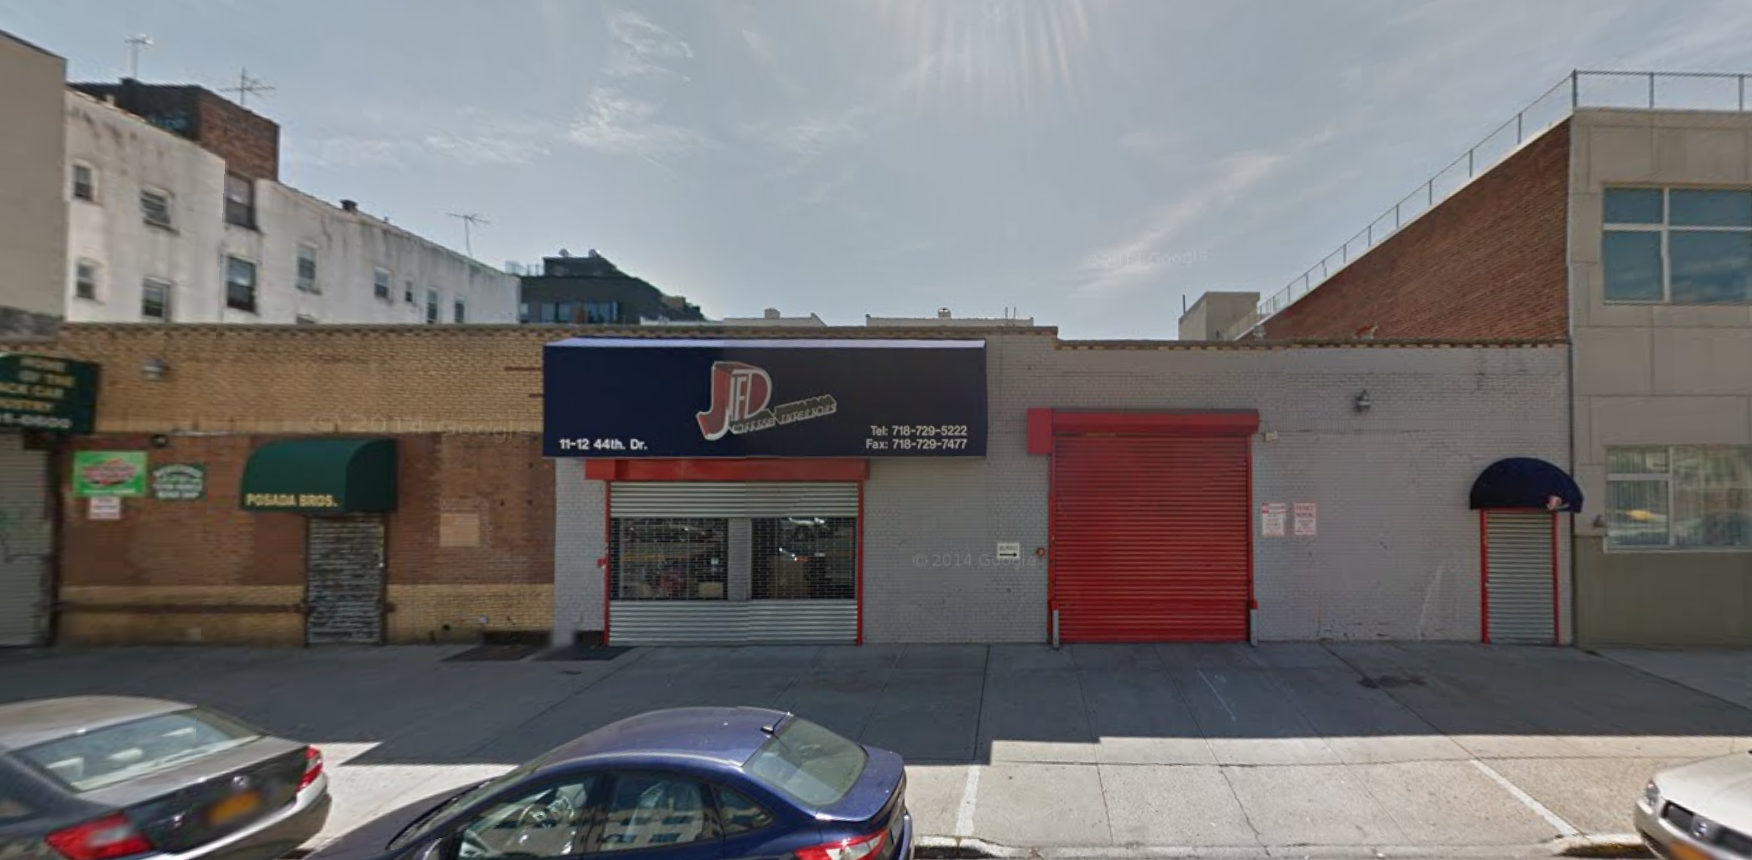 11-12 44th Drive, image via Google Maps